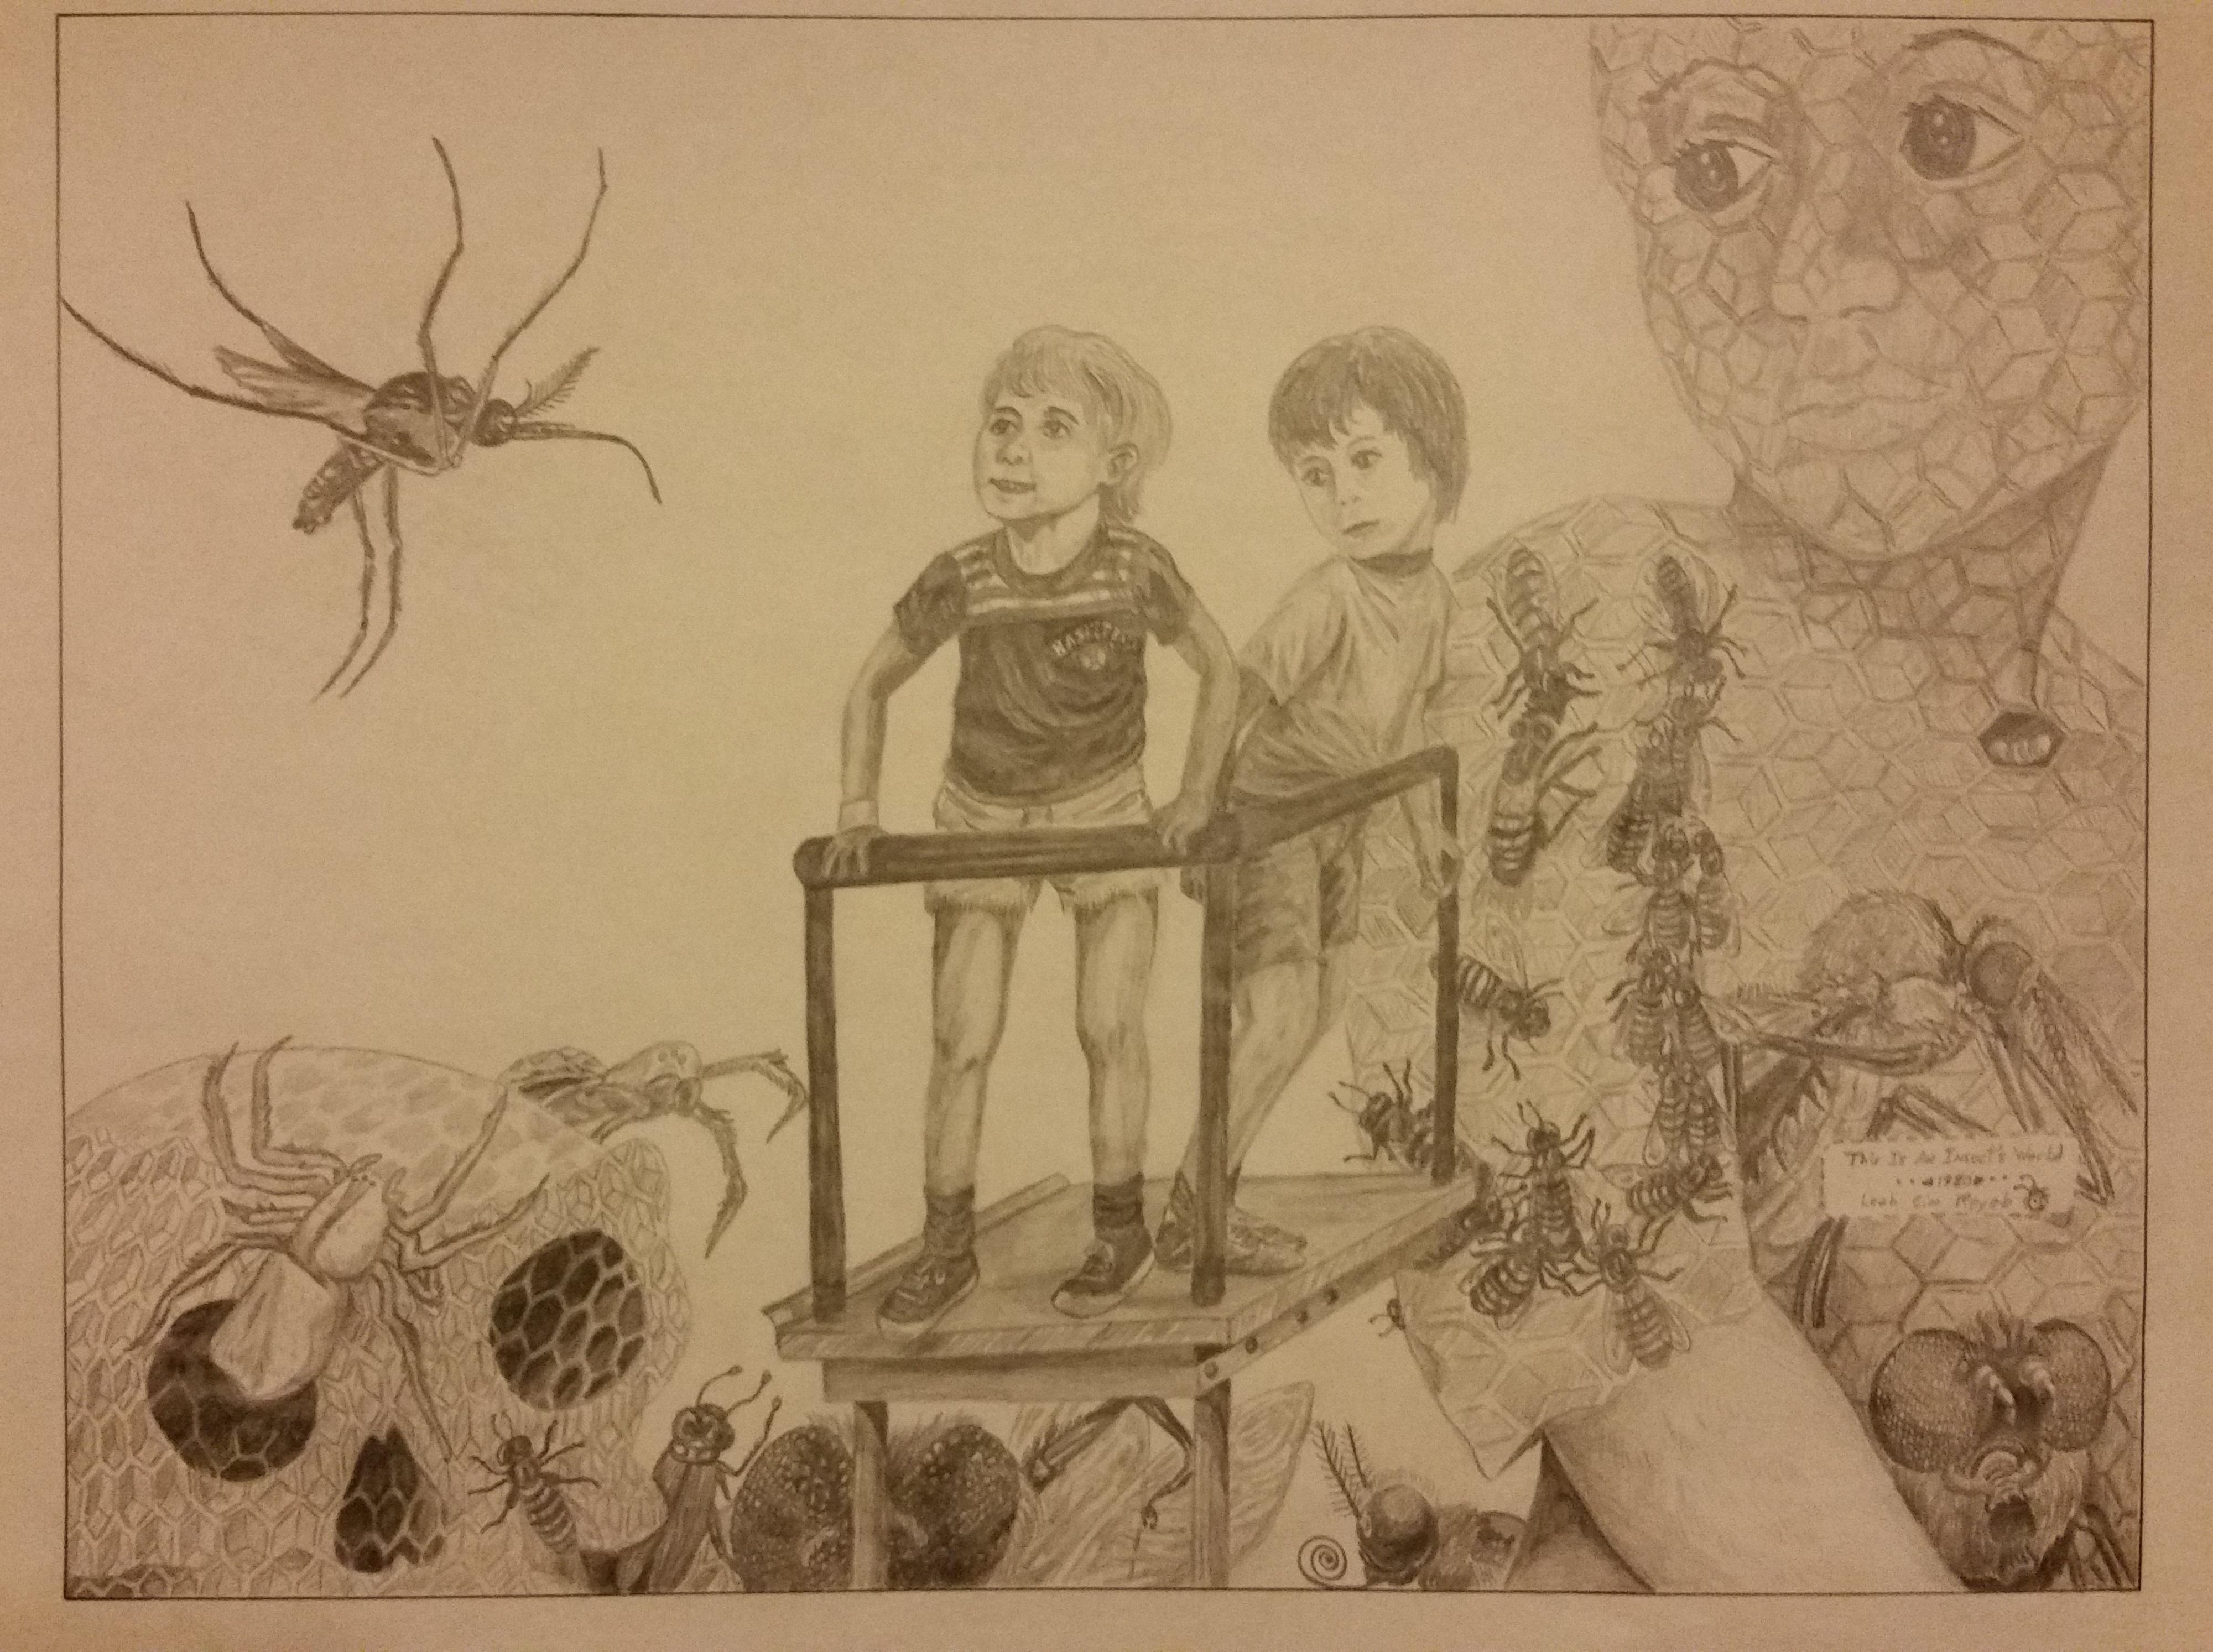 bugworld